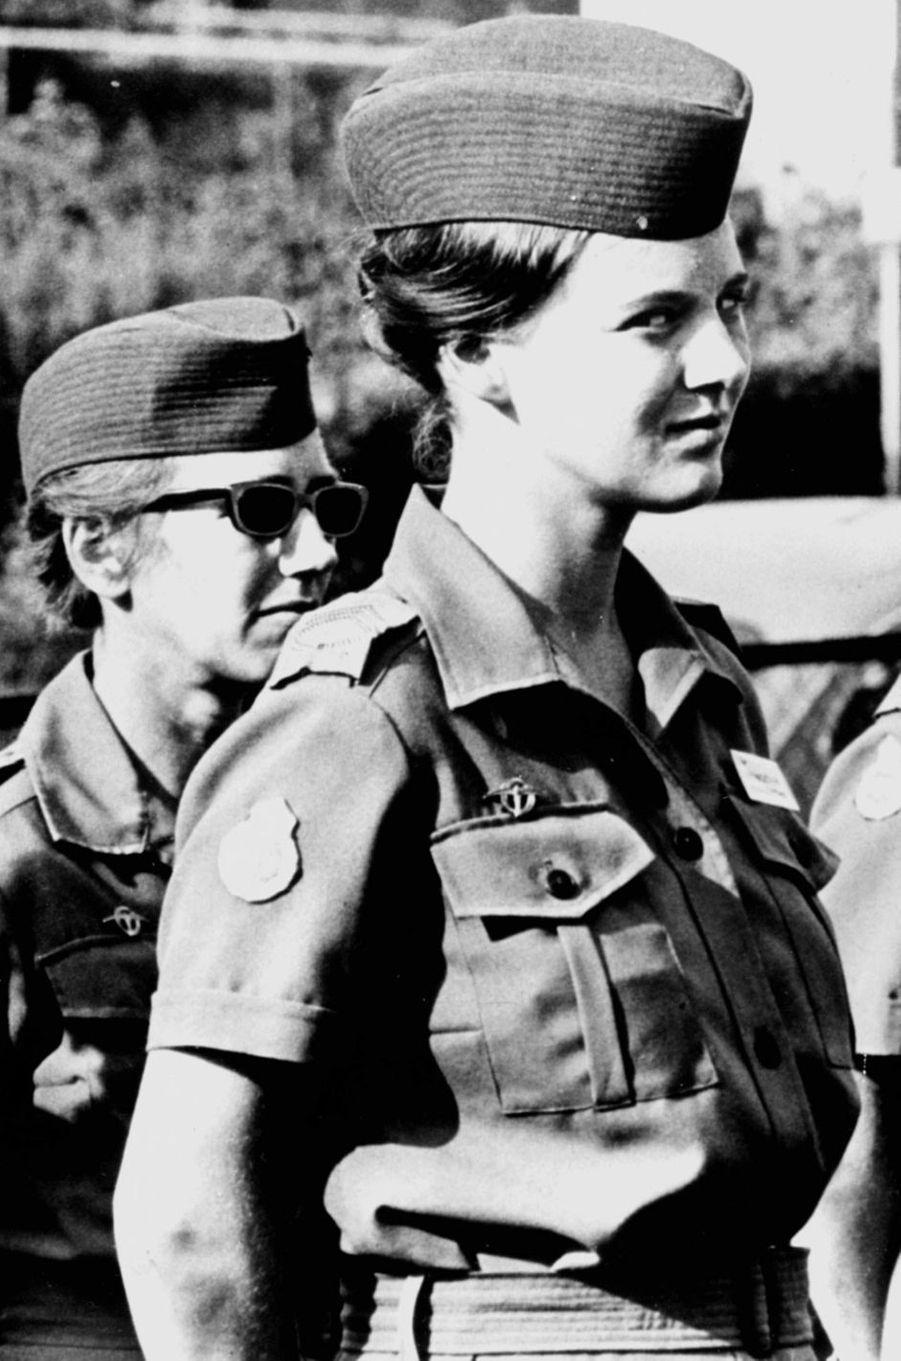 La princesse Margrethe de Danemark (futur reine Margrethe II), le 16 avril 1966